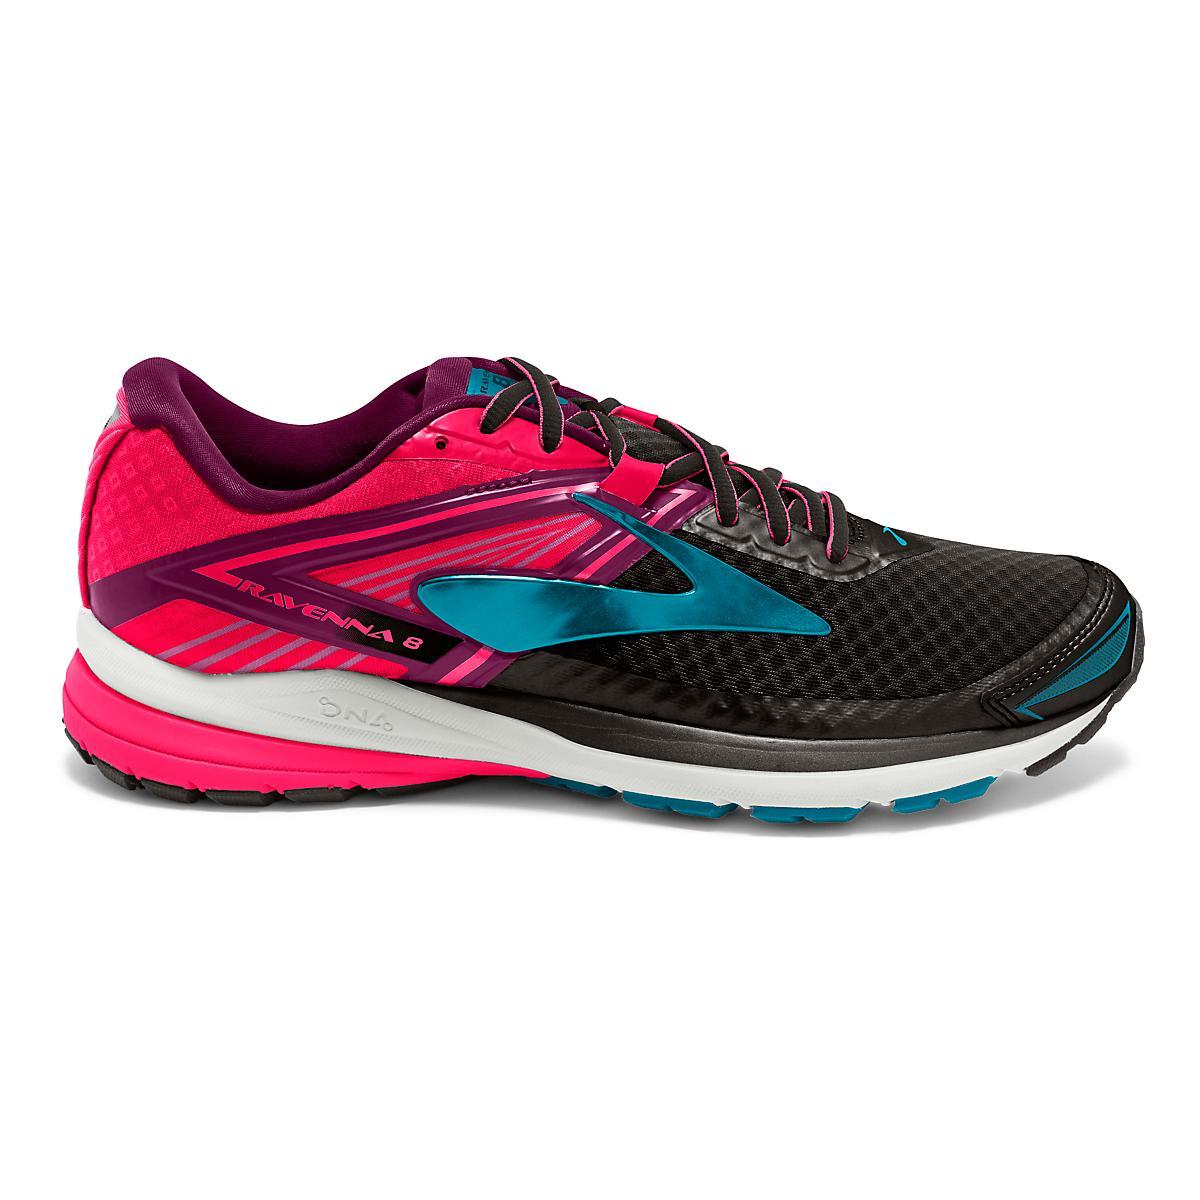 ade8ea1fb63 Womens Brooks Ravenna 8 Running Shoe at Road Runner Sports